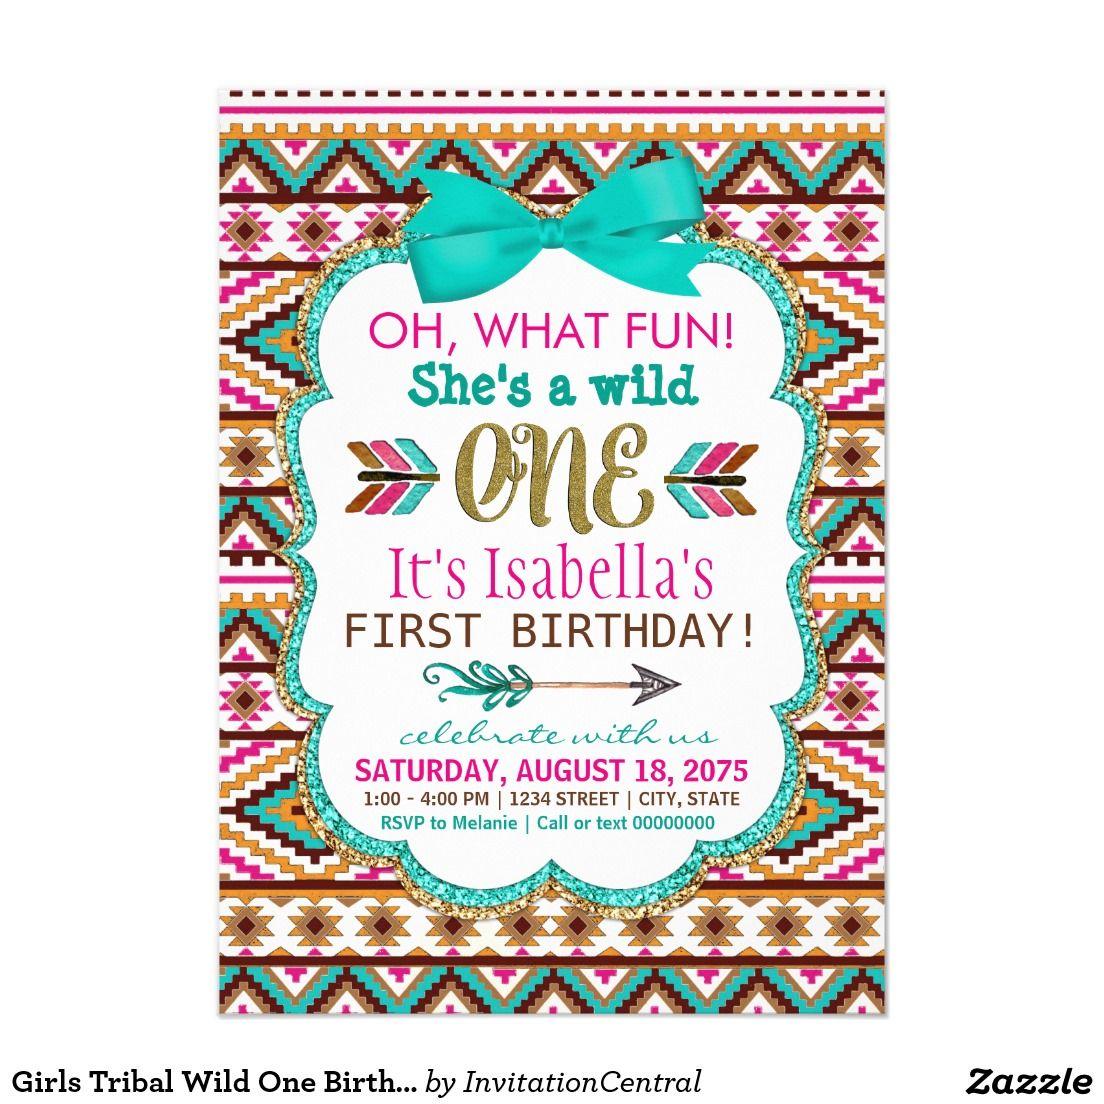 Girls Tribal Wild One Birthday Party Invitations First Birthday - Invitation birthday party girl